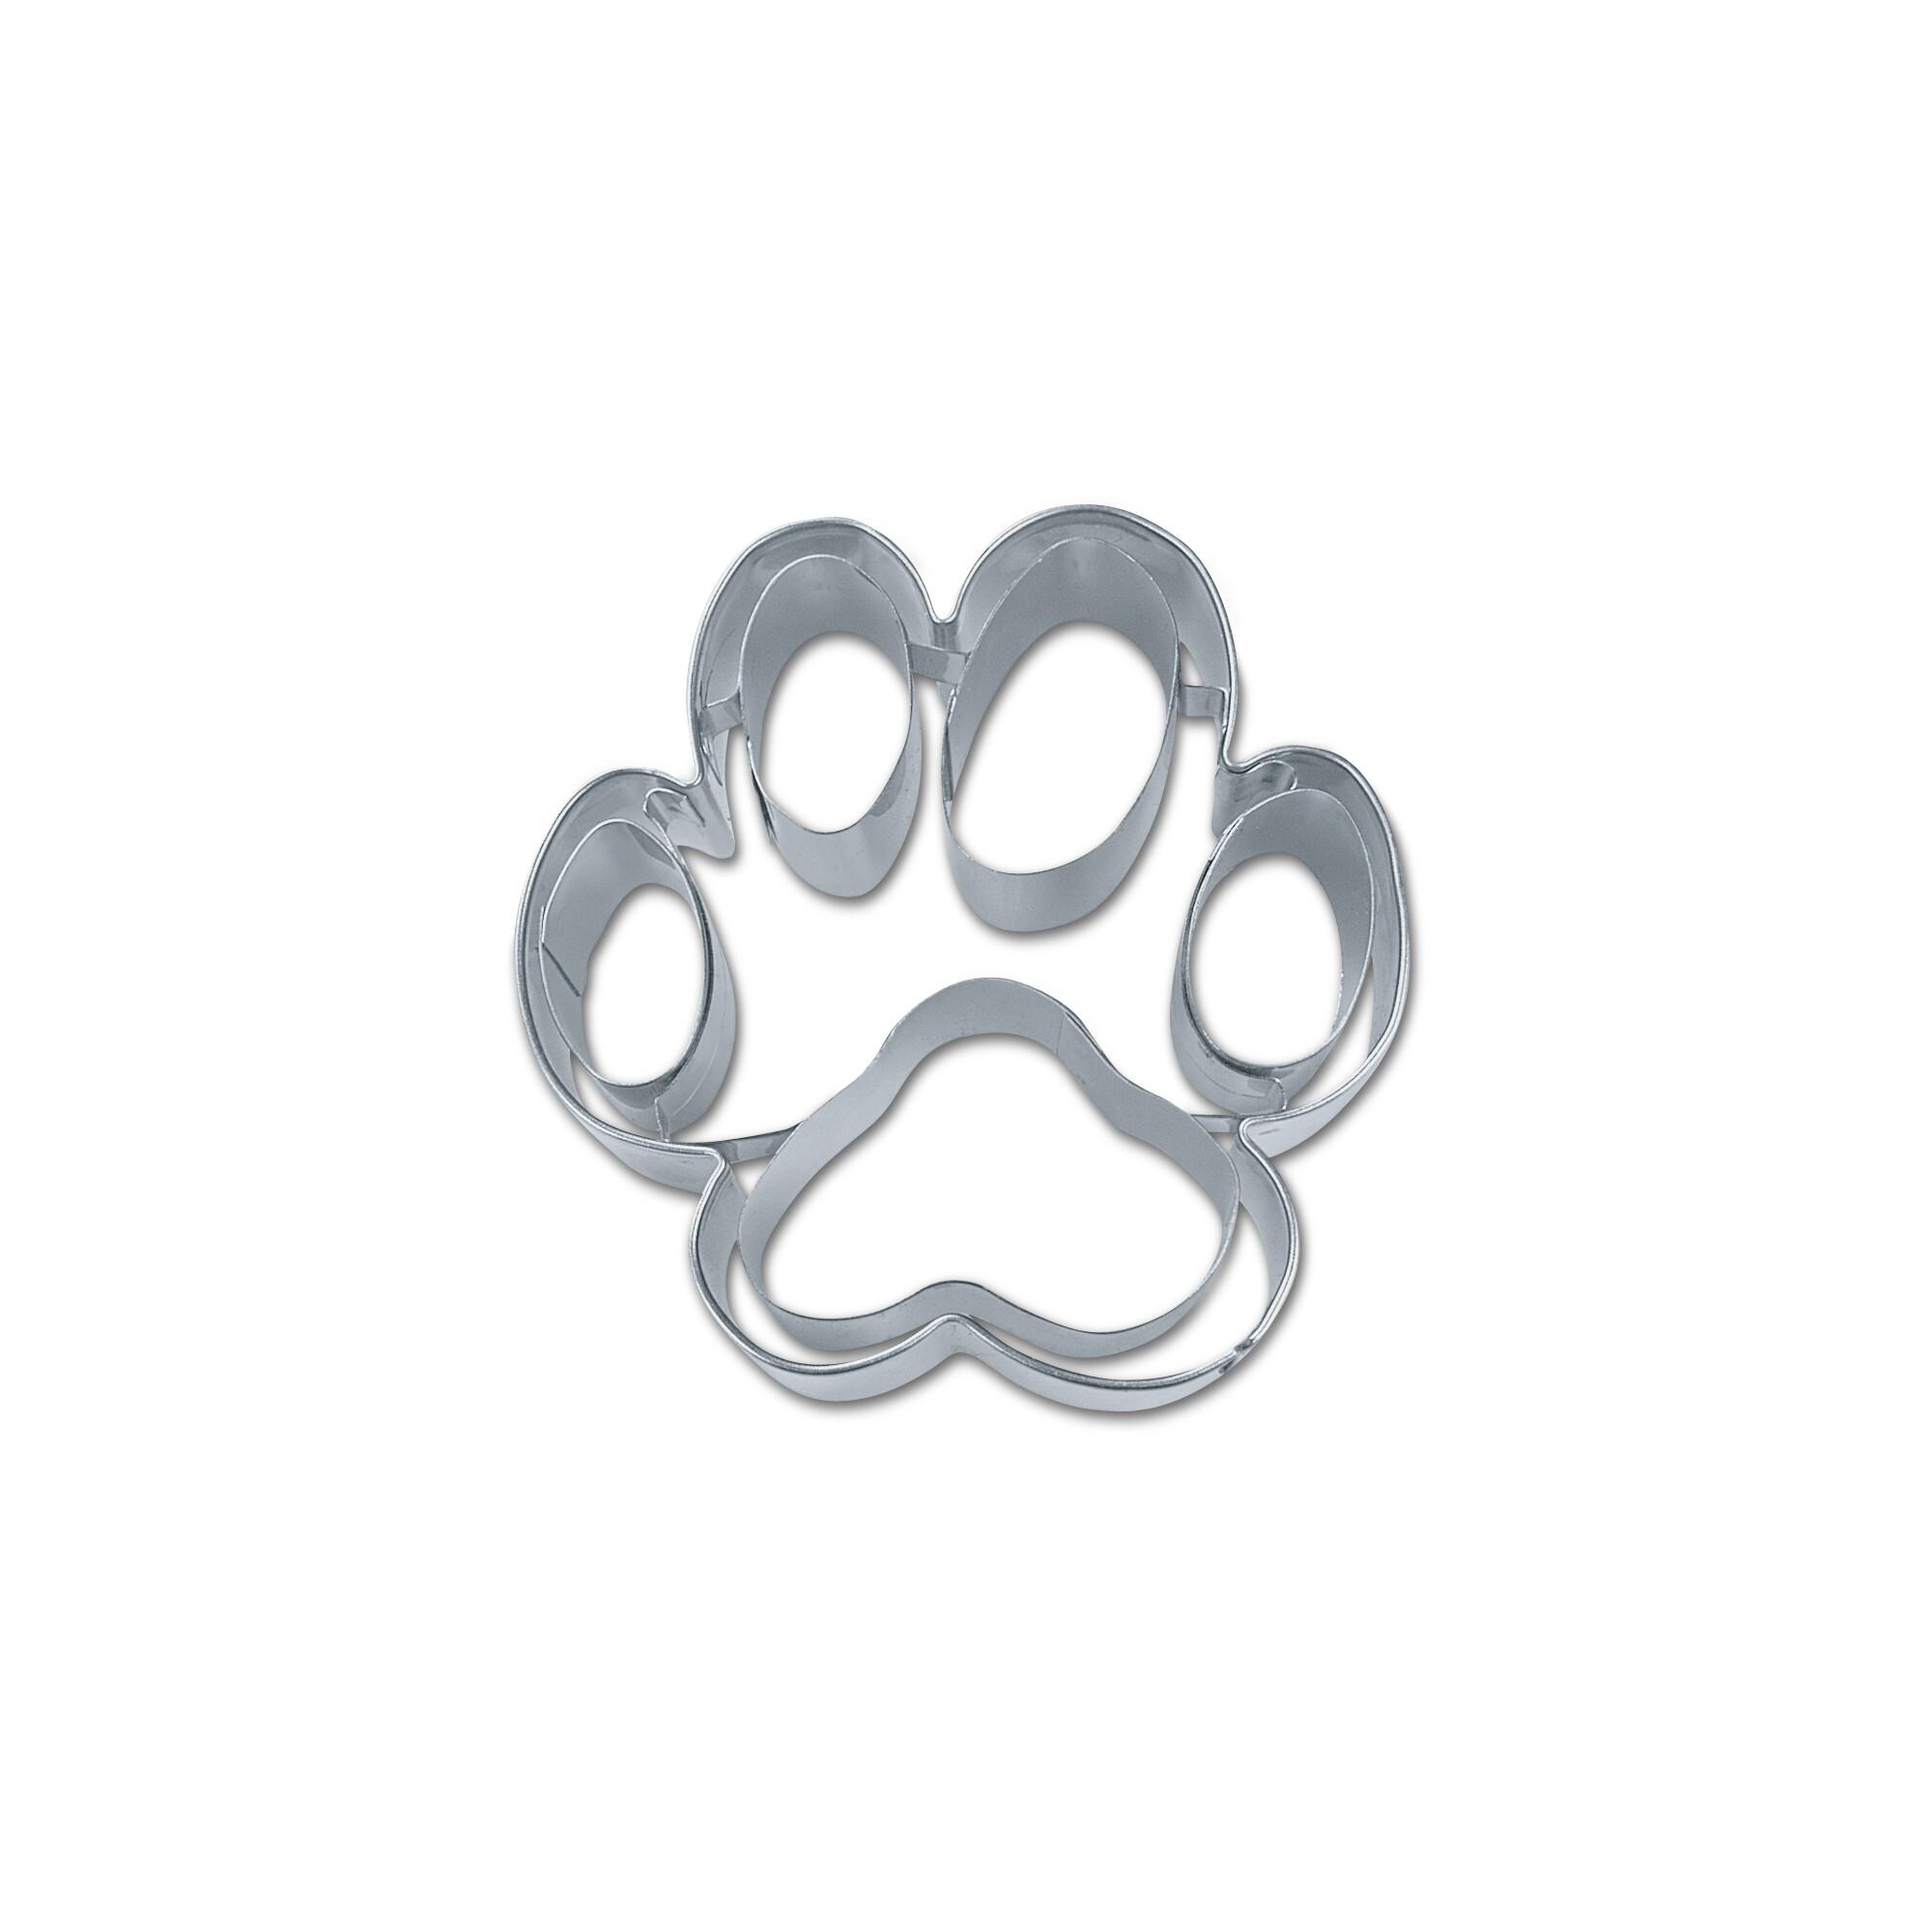 Präge-Ausstecher - Hundepfote